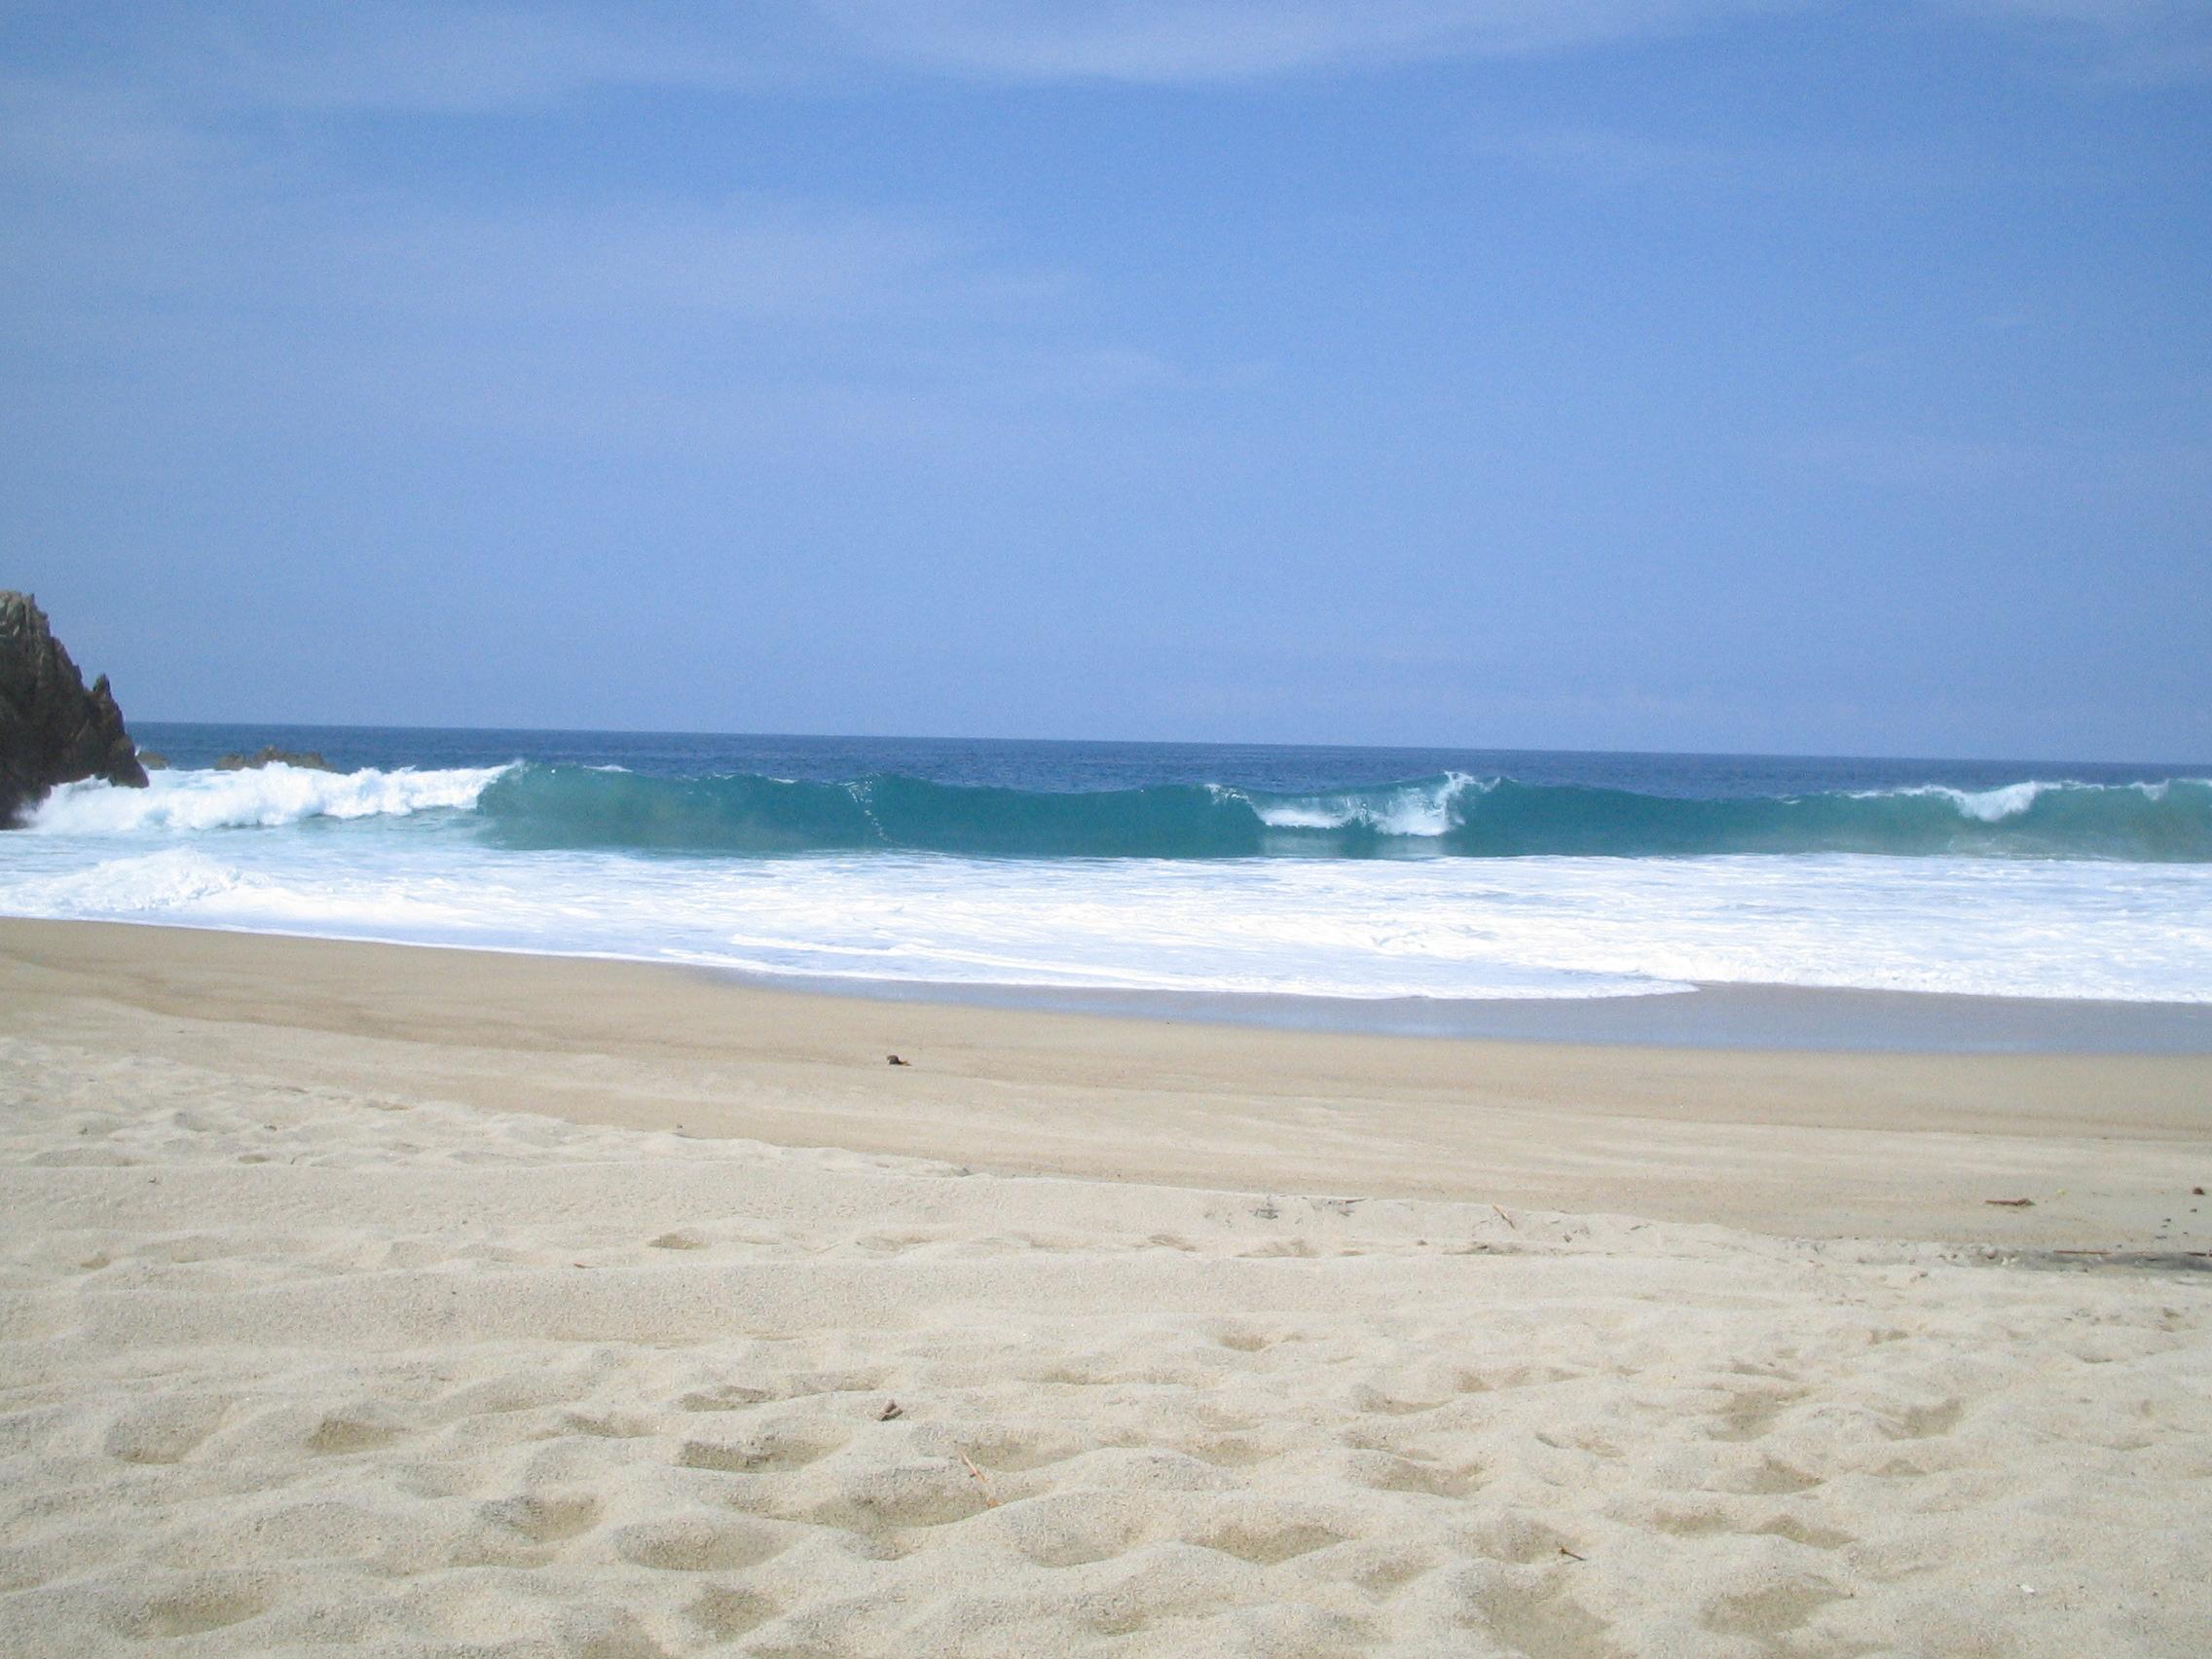 File:Playa maruata.JPG...